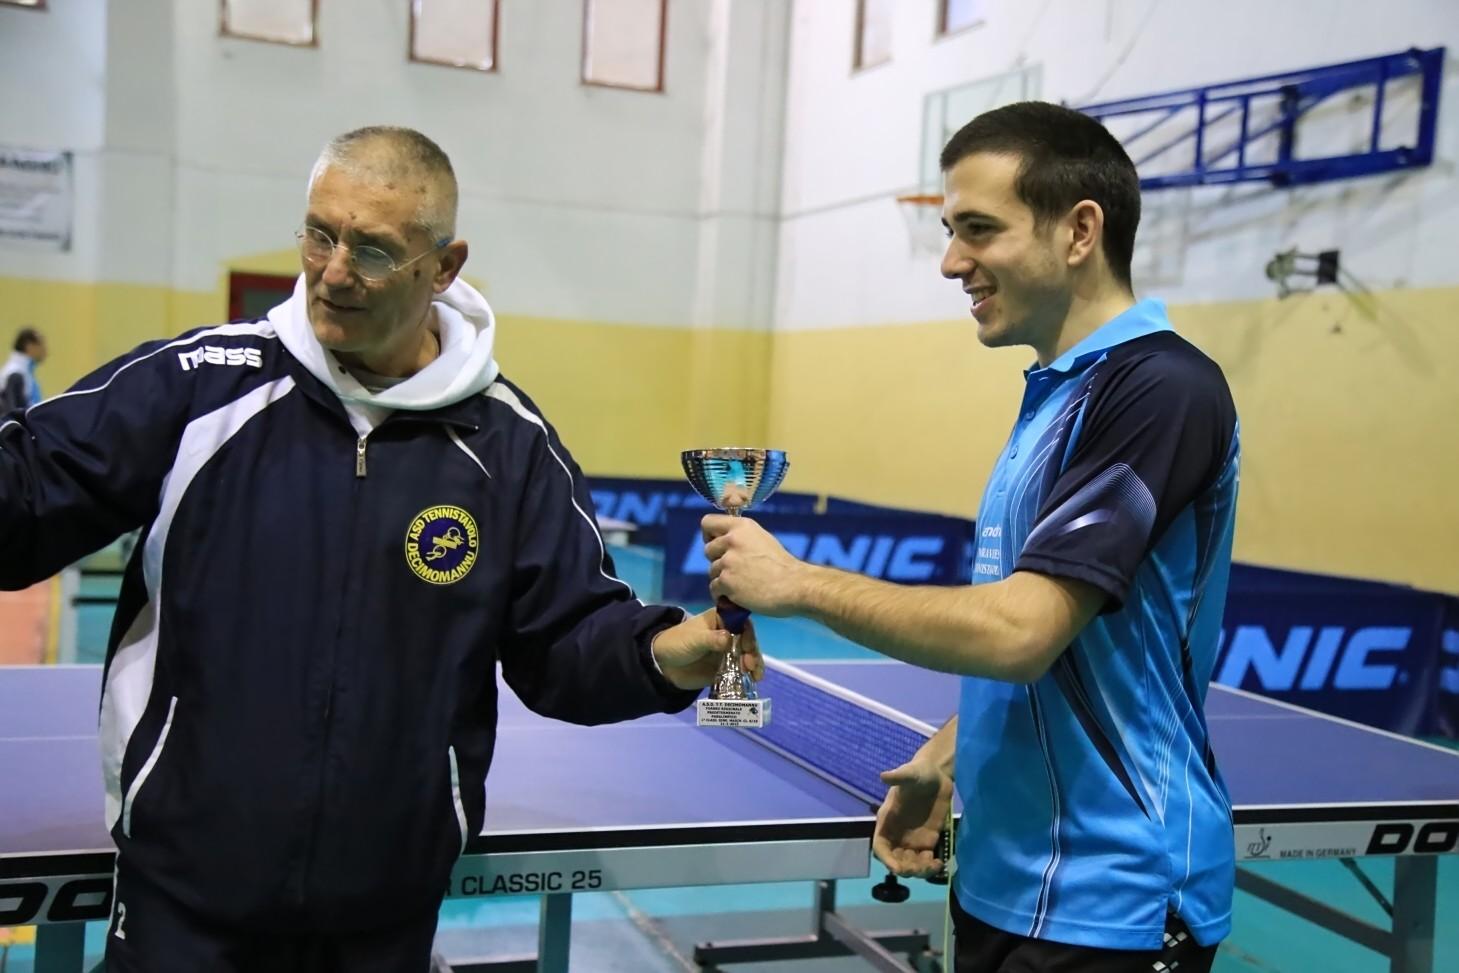 Luca Paganelli primo nei Paralimpici (Foto Tomaso Fenu)